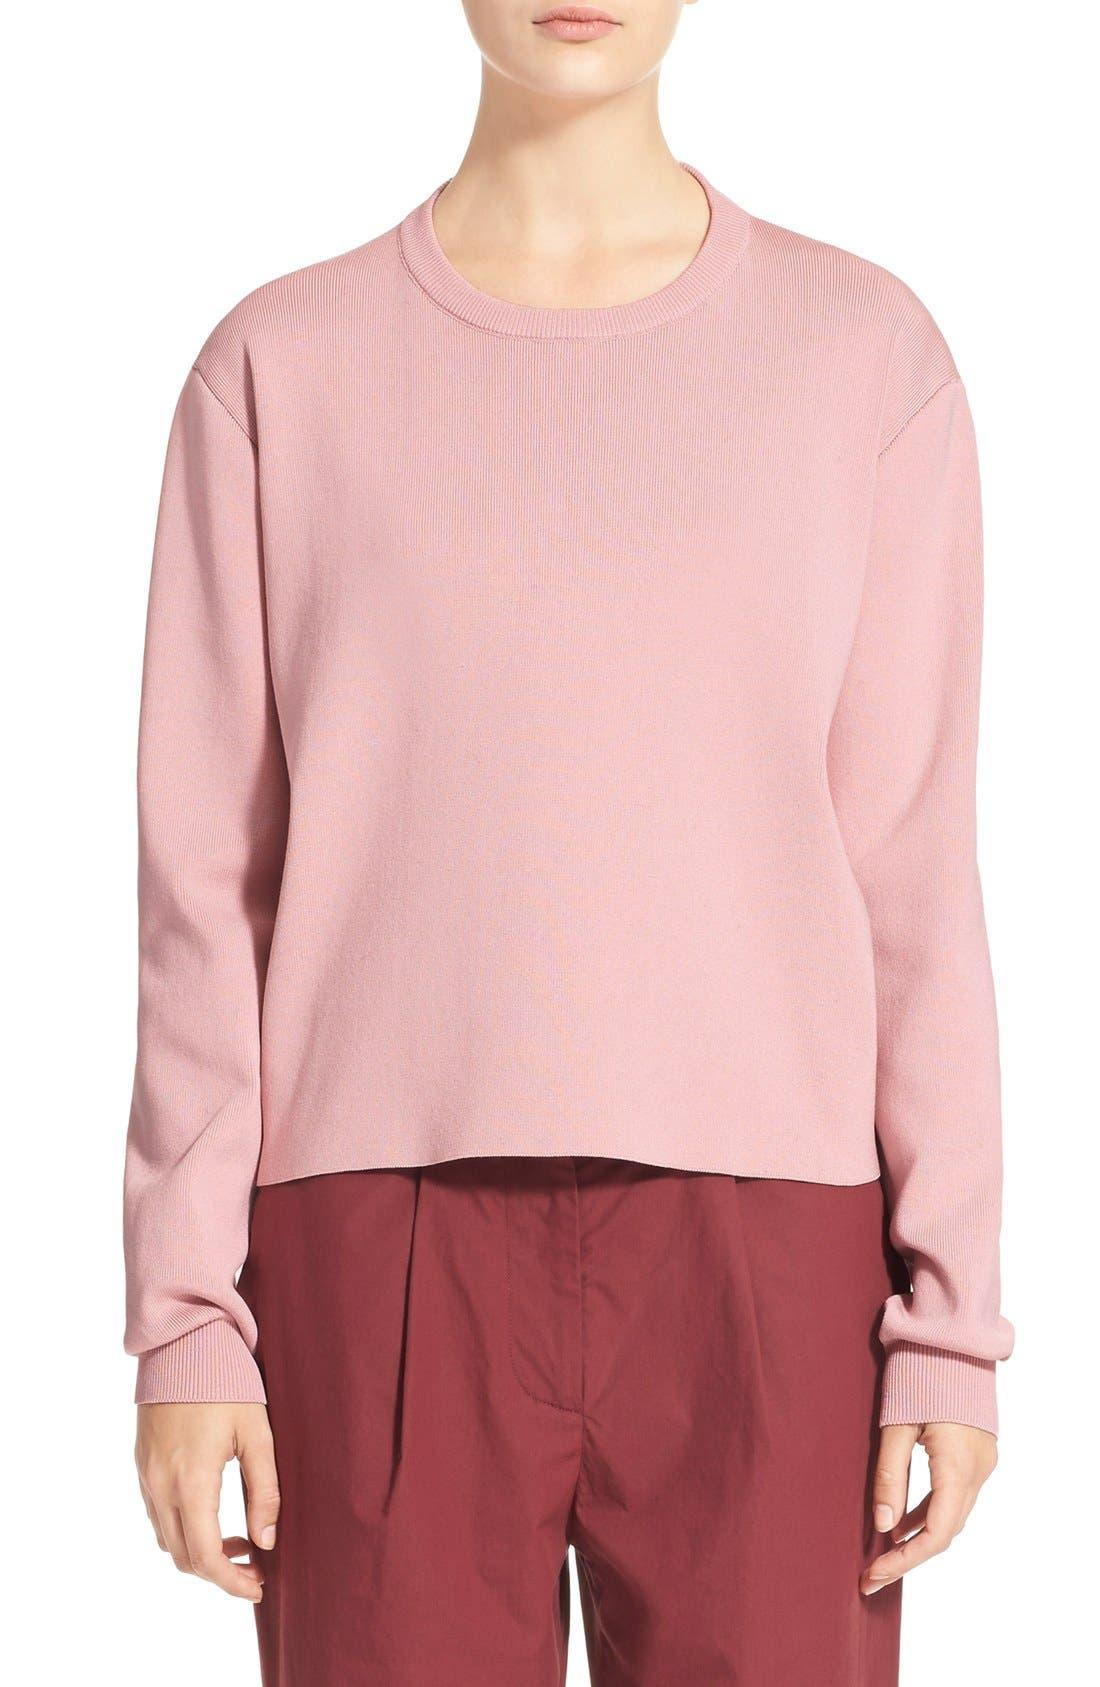 Alternate Image 1 Selected - ACNE 'Misty Clean' Cotton Crewneck Sweater